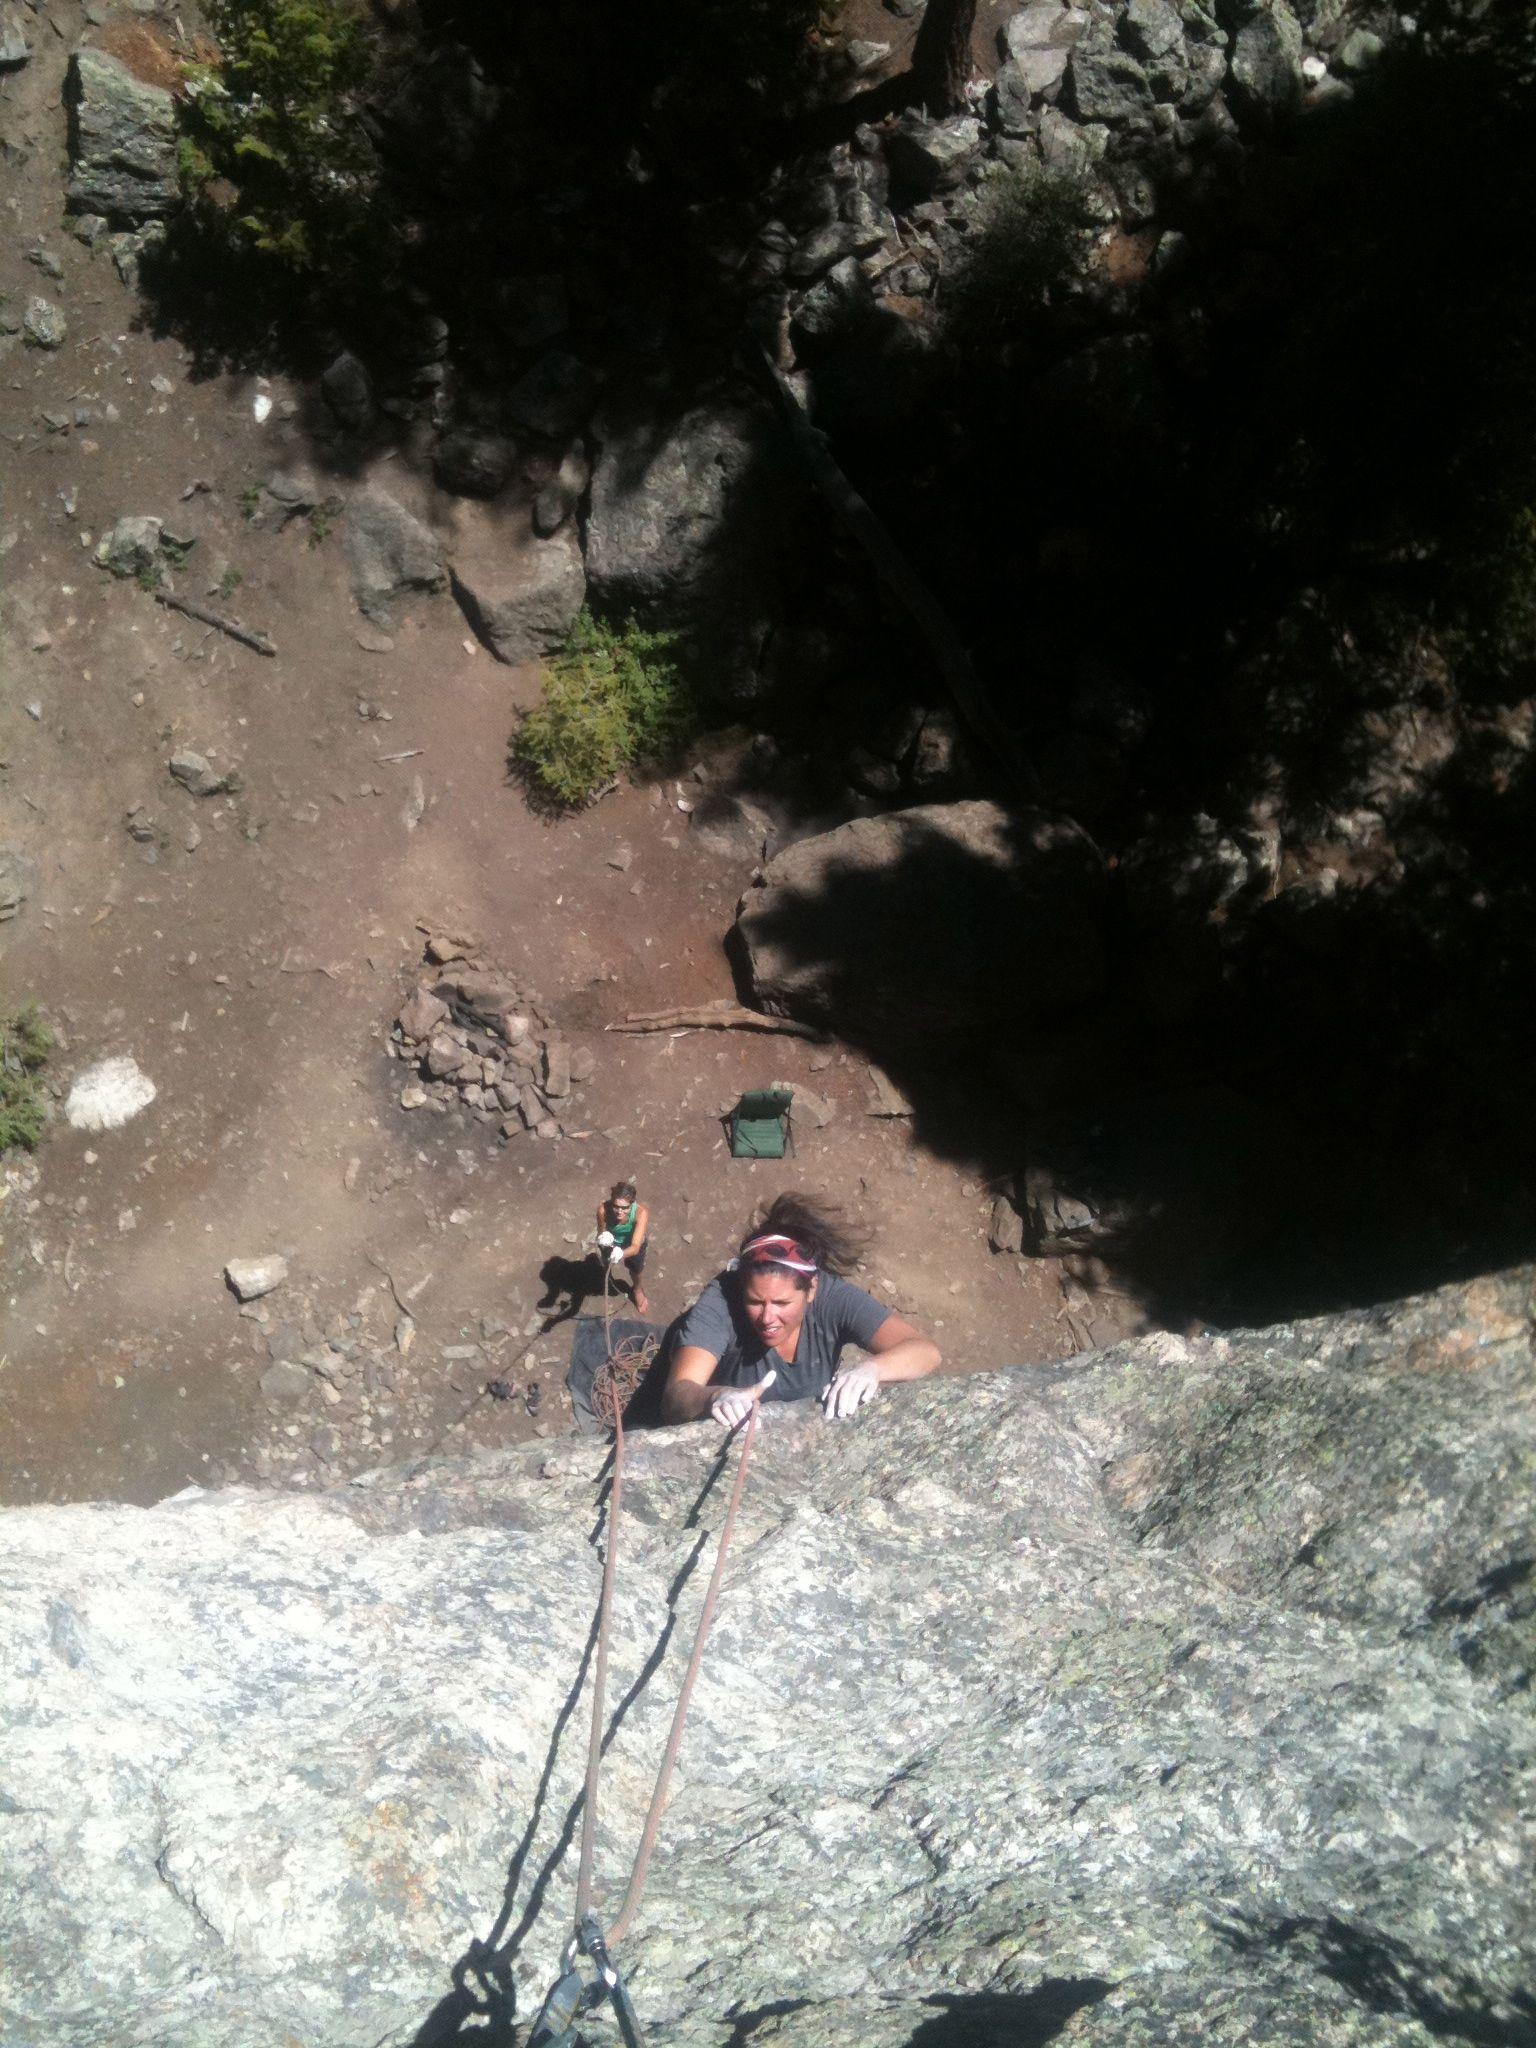 Climbing at montezuma co outdoor activities